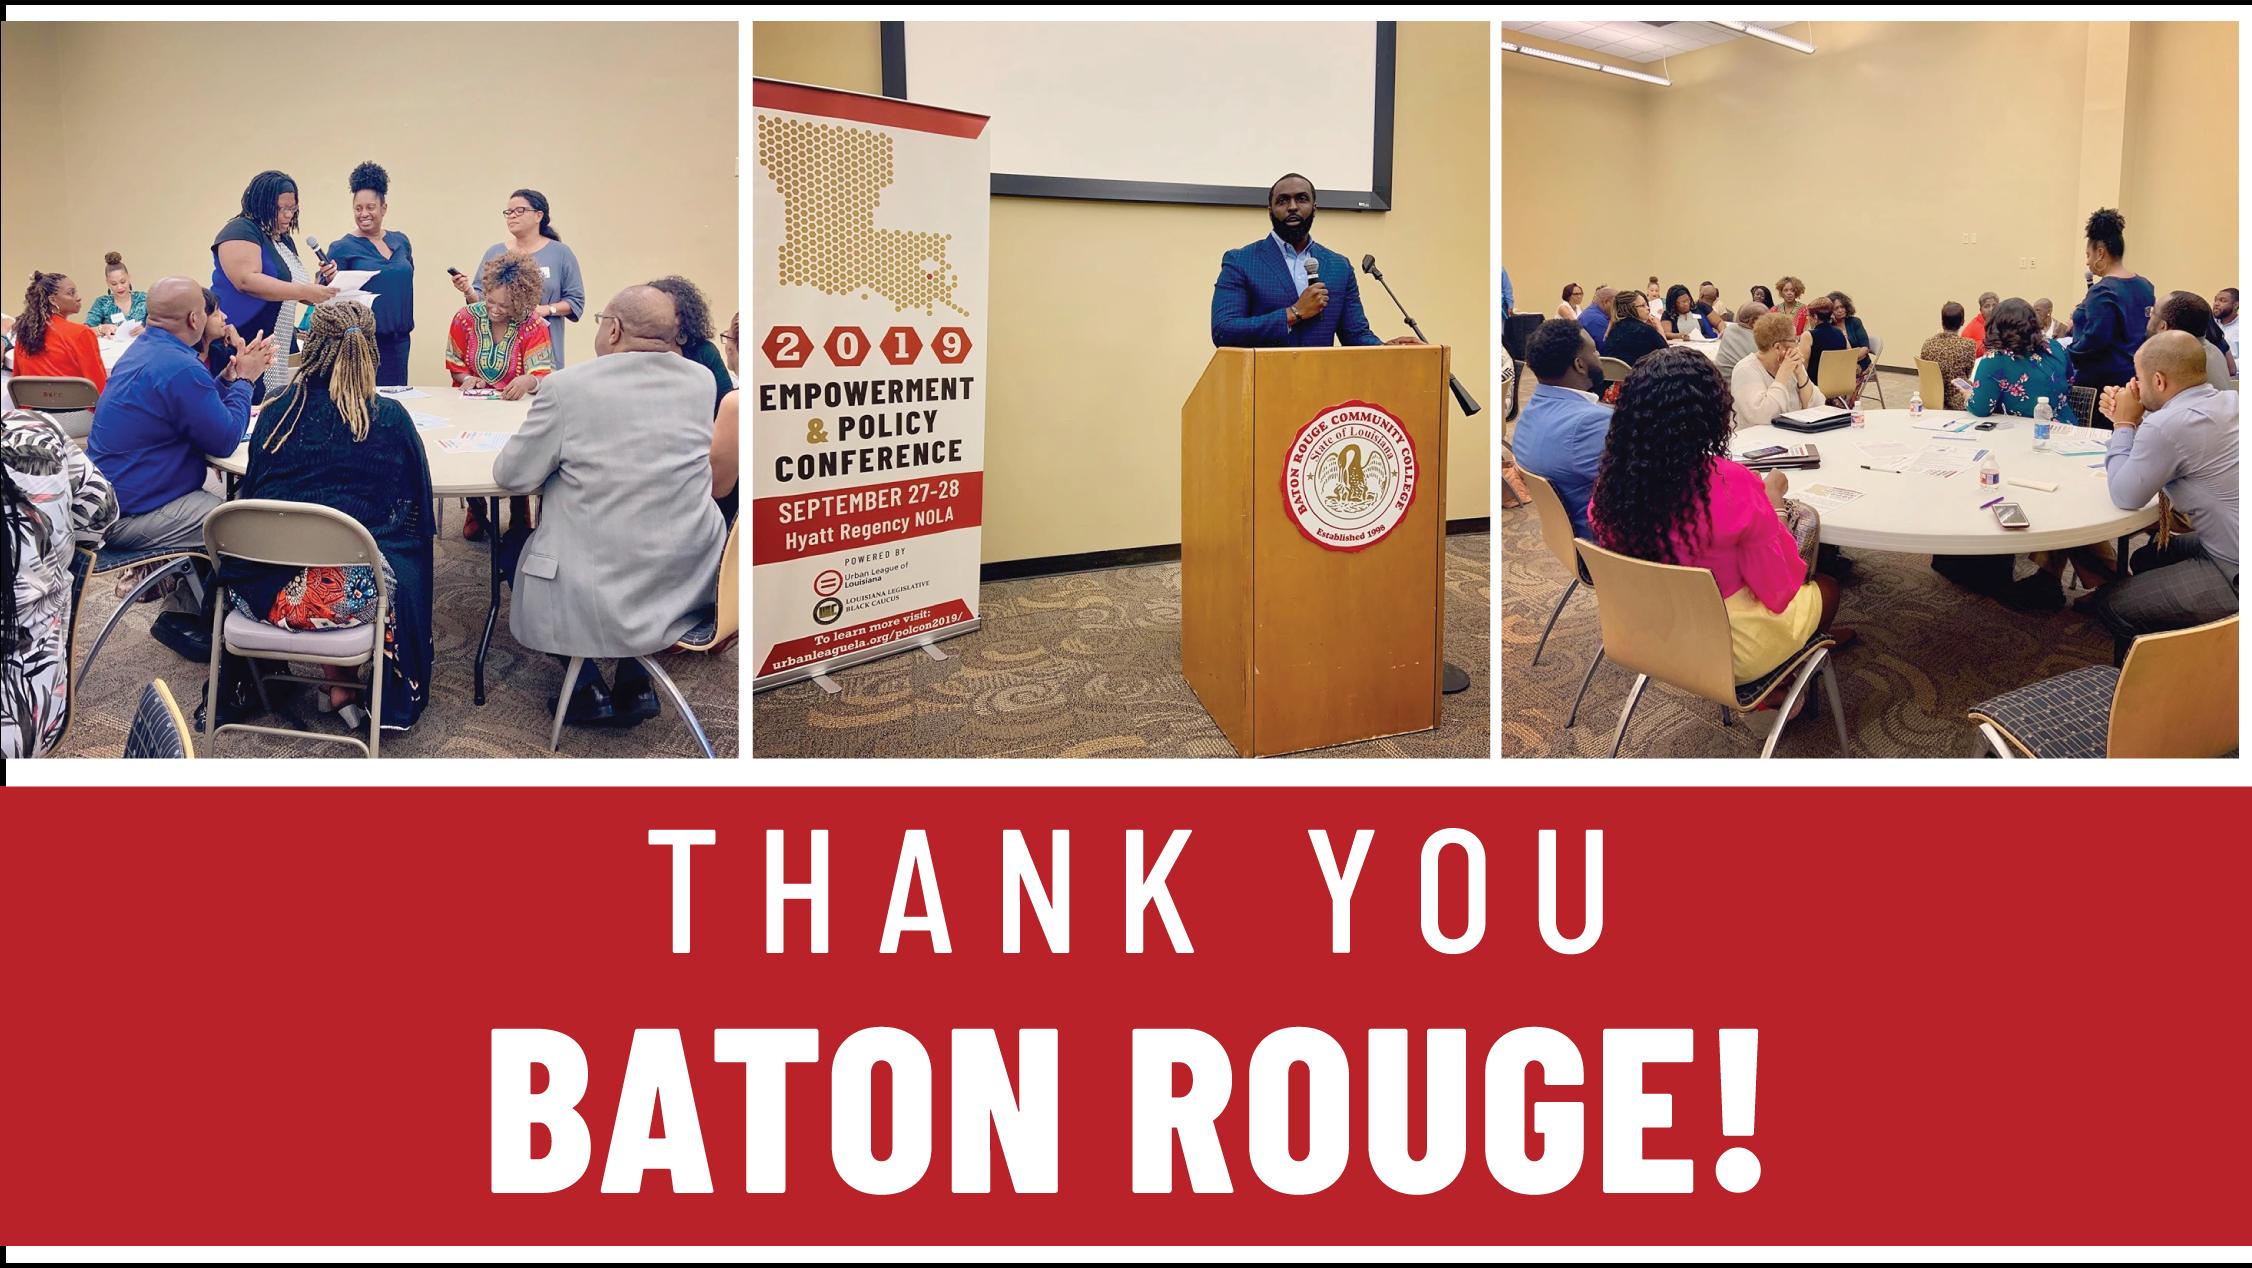 Thank you Baton Rouge